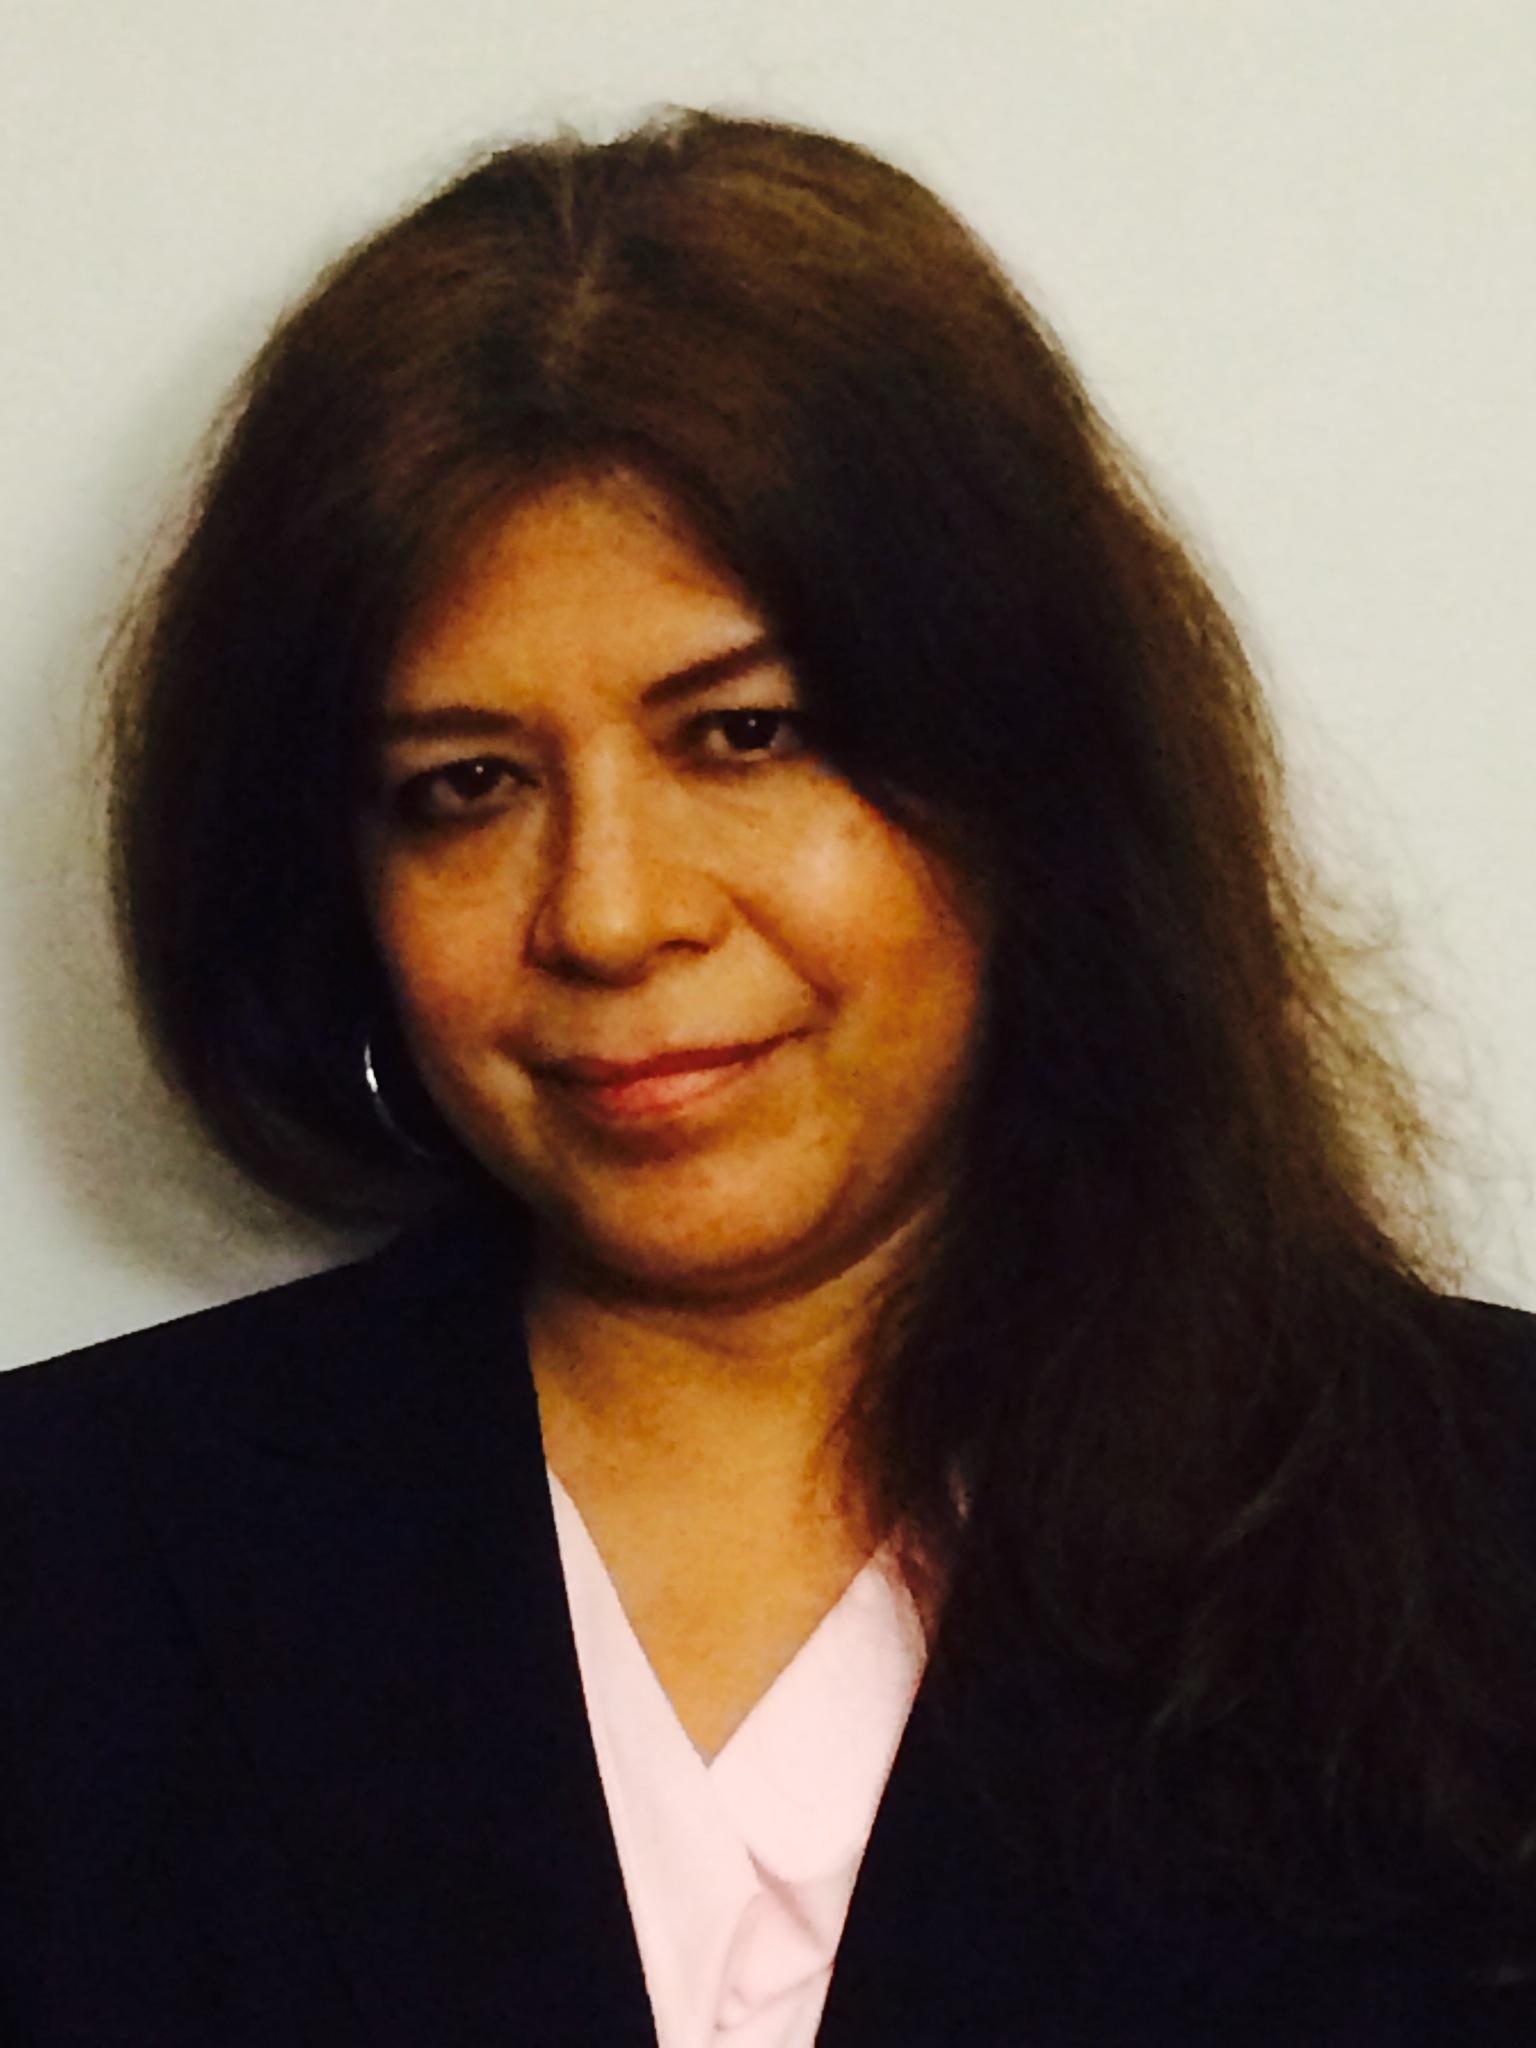 Maria del Carmen Amado